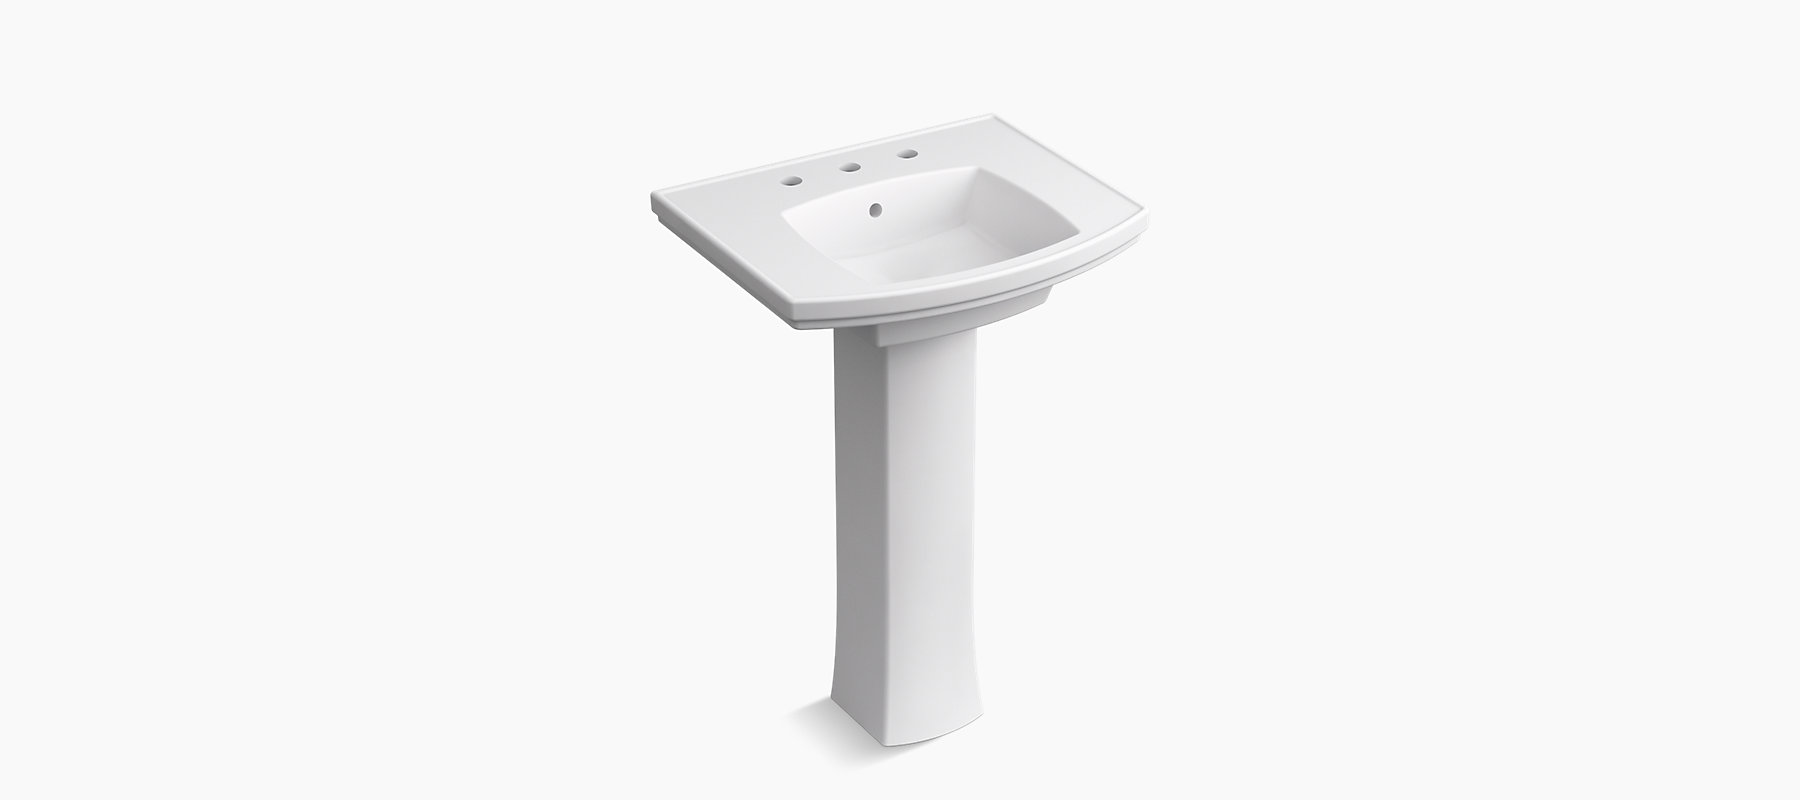 Elliston Pedestal Bathroom Sink 8 Inch Widespread K